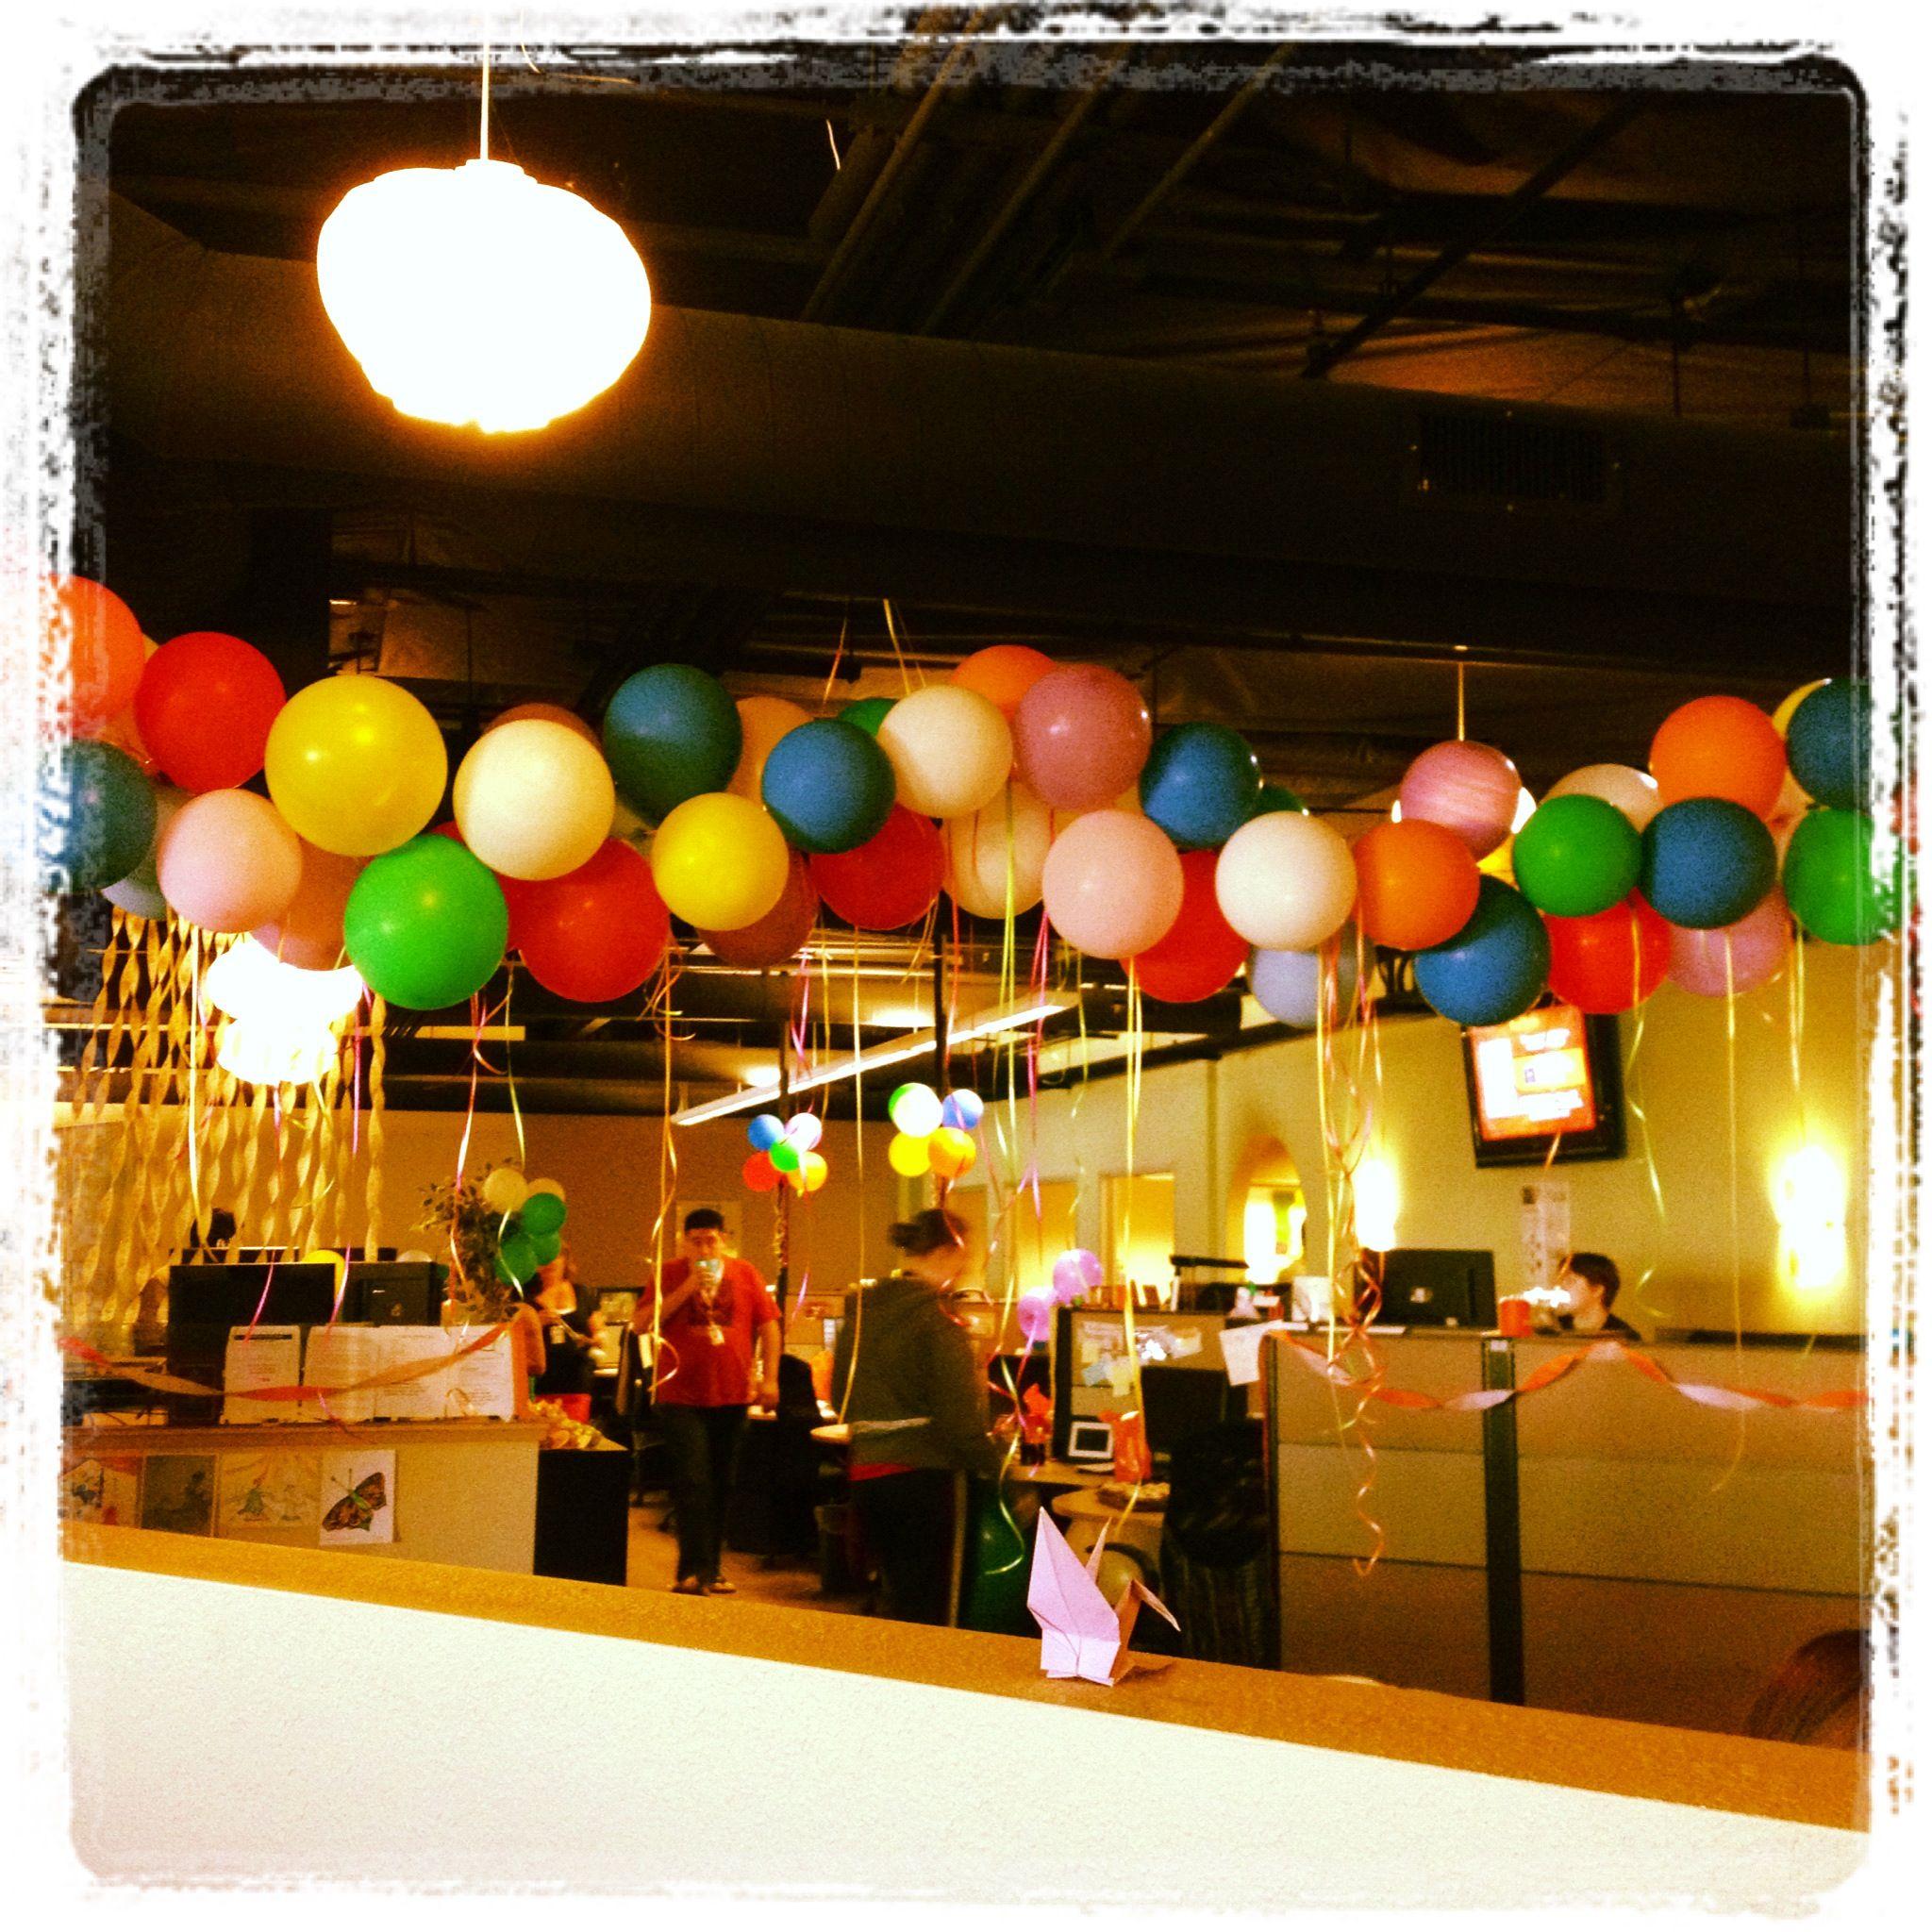 National Customer Service Week! celebrateCS mindbody